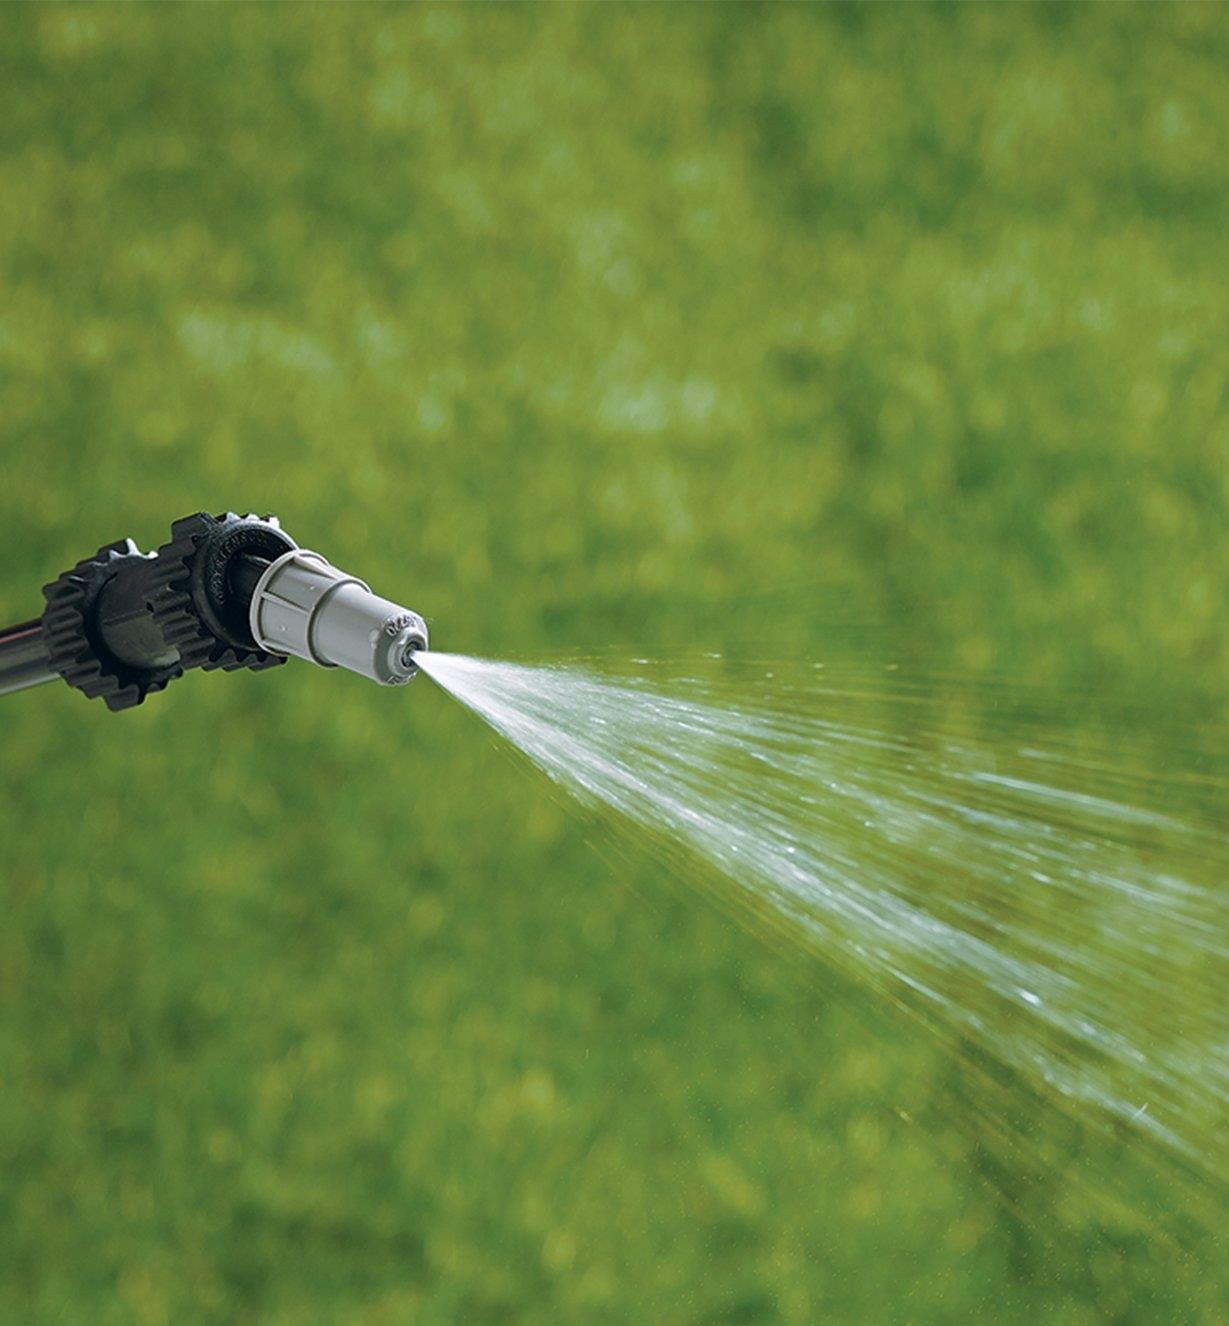 Garden Sprayer wand using the spray setting